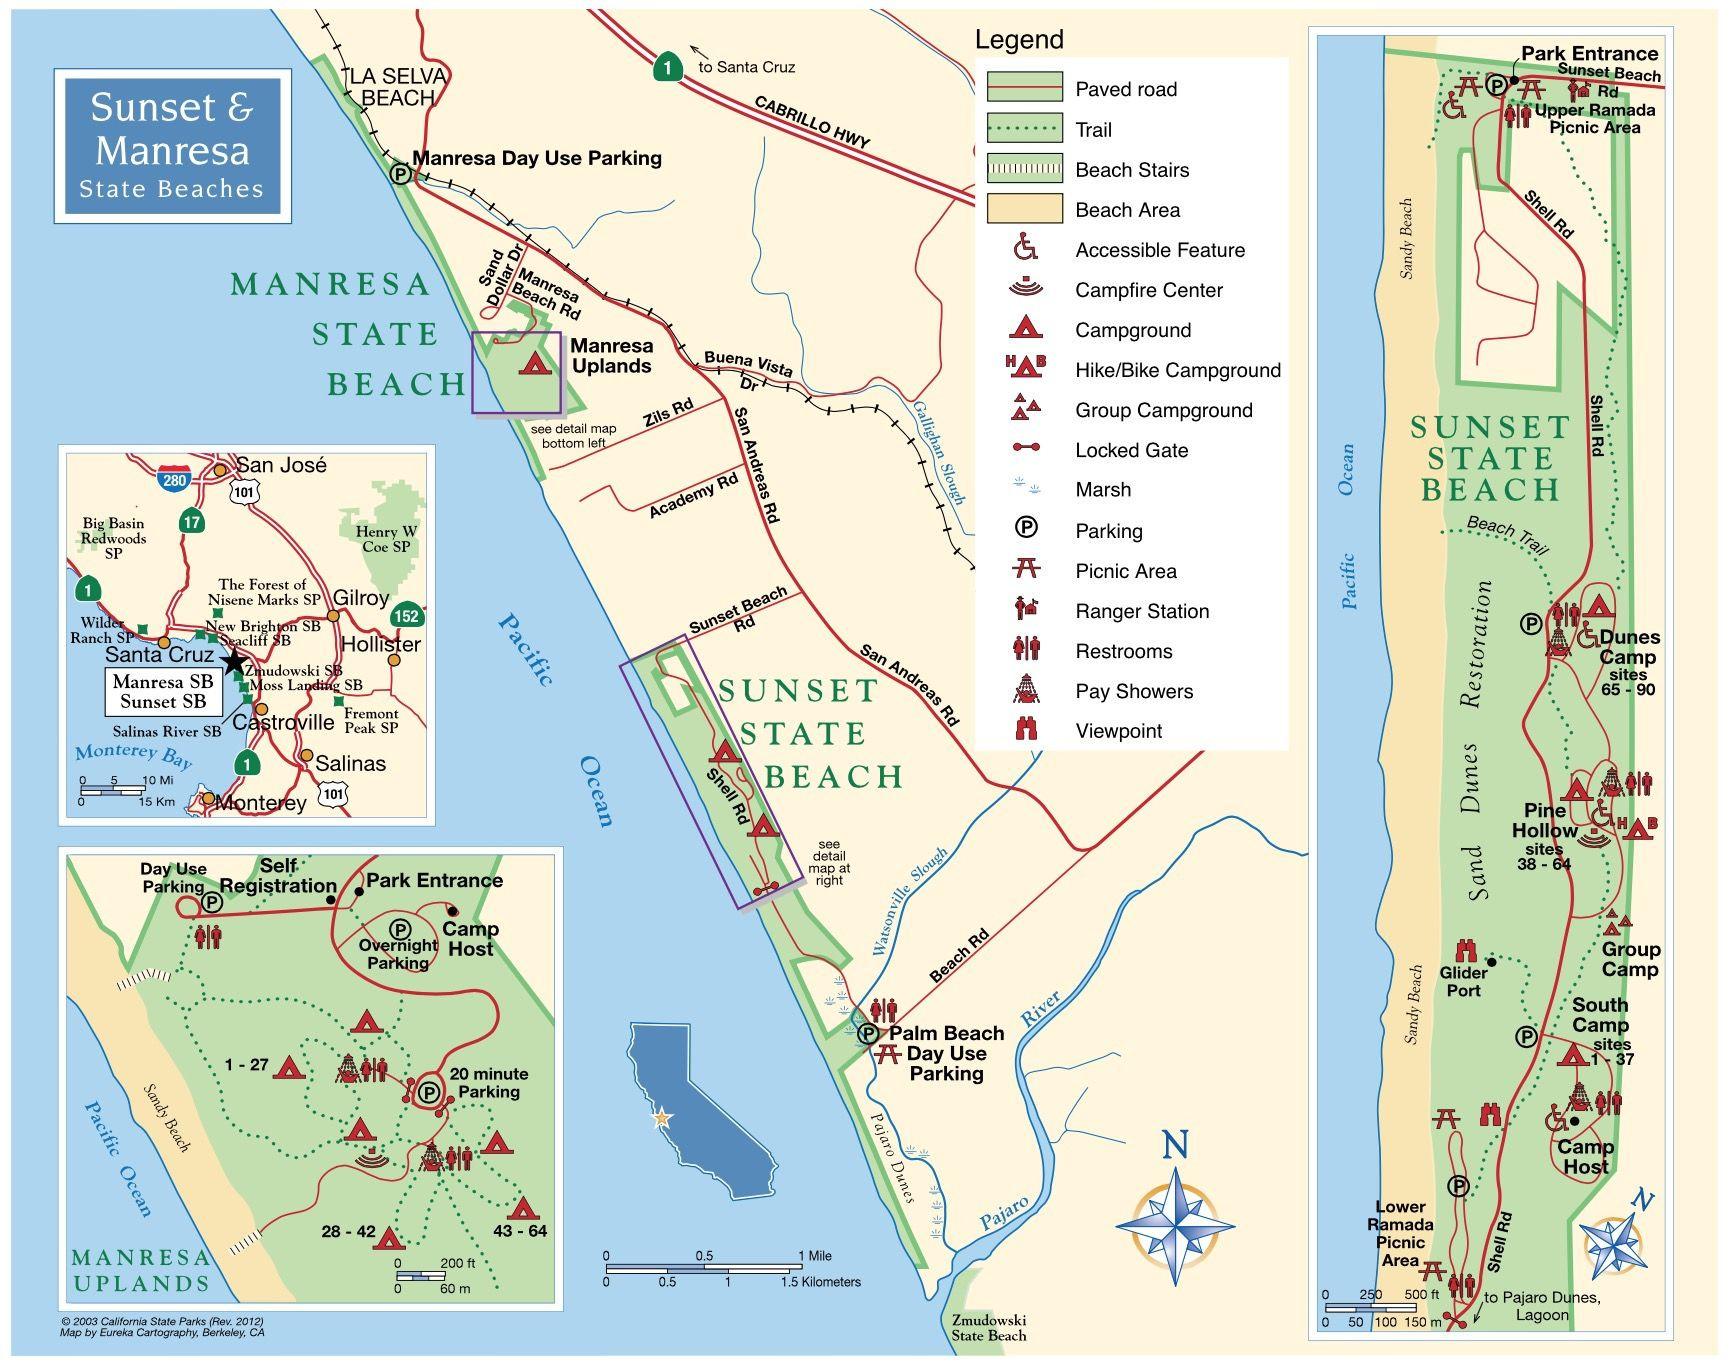 Map Of Pismo Beach California Free Printable Sunset State Beach - Pismo Beach California Map